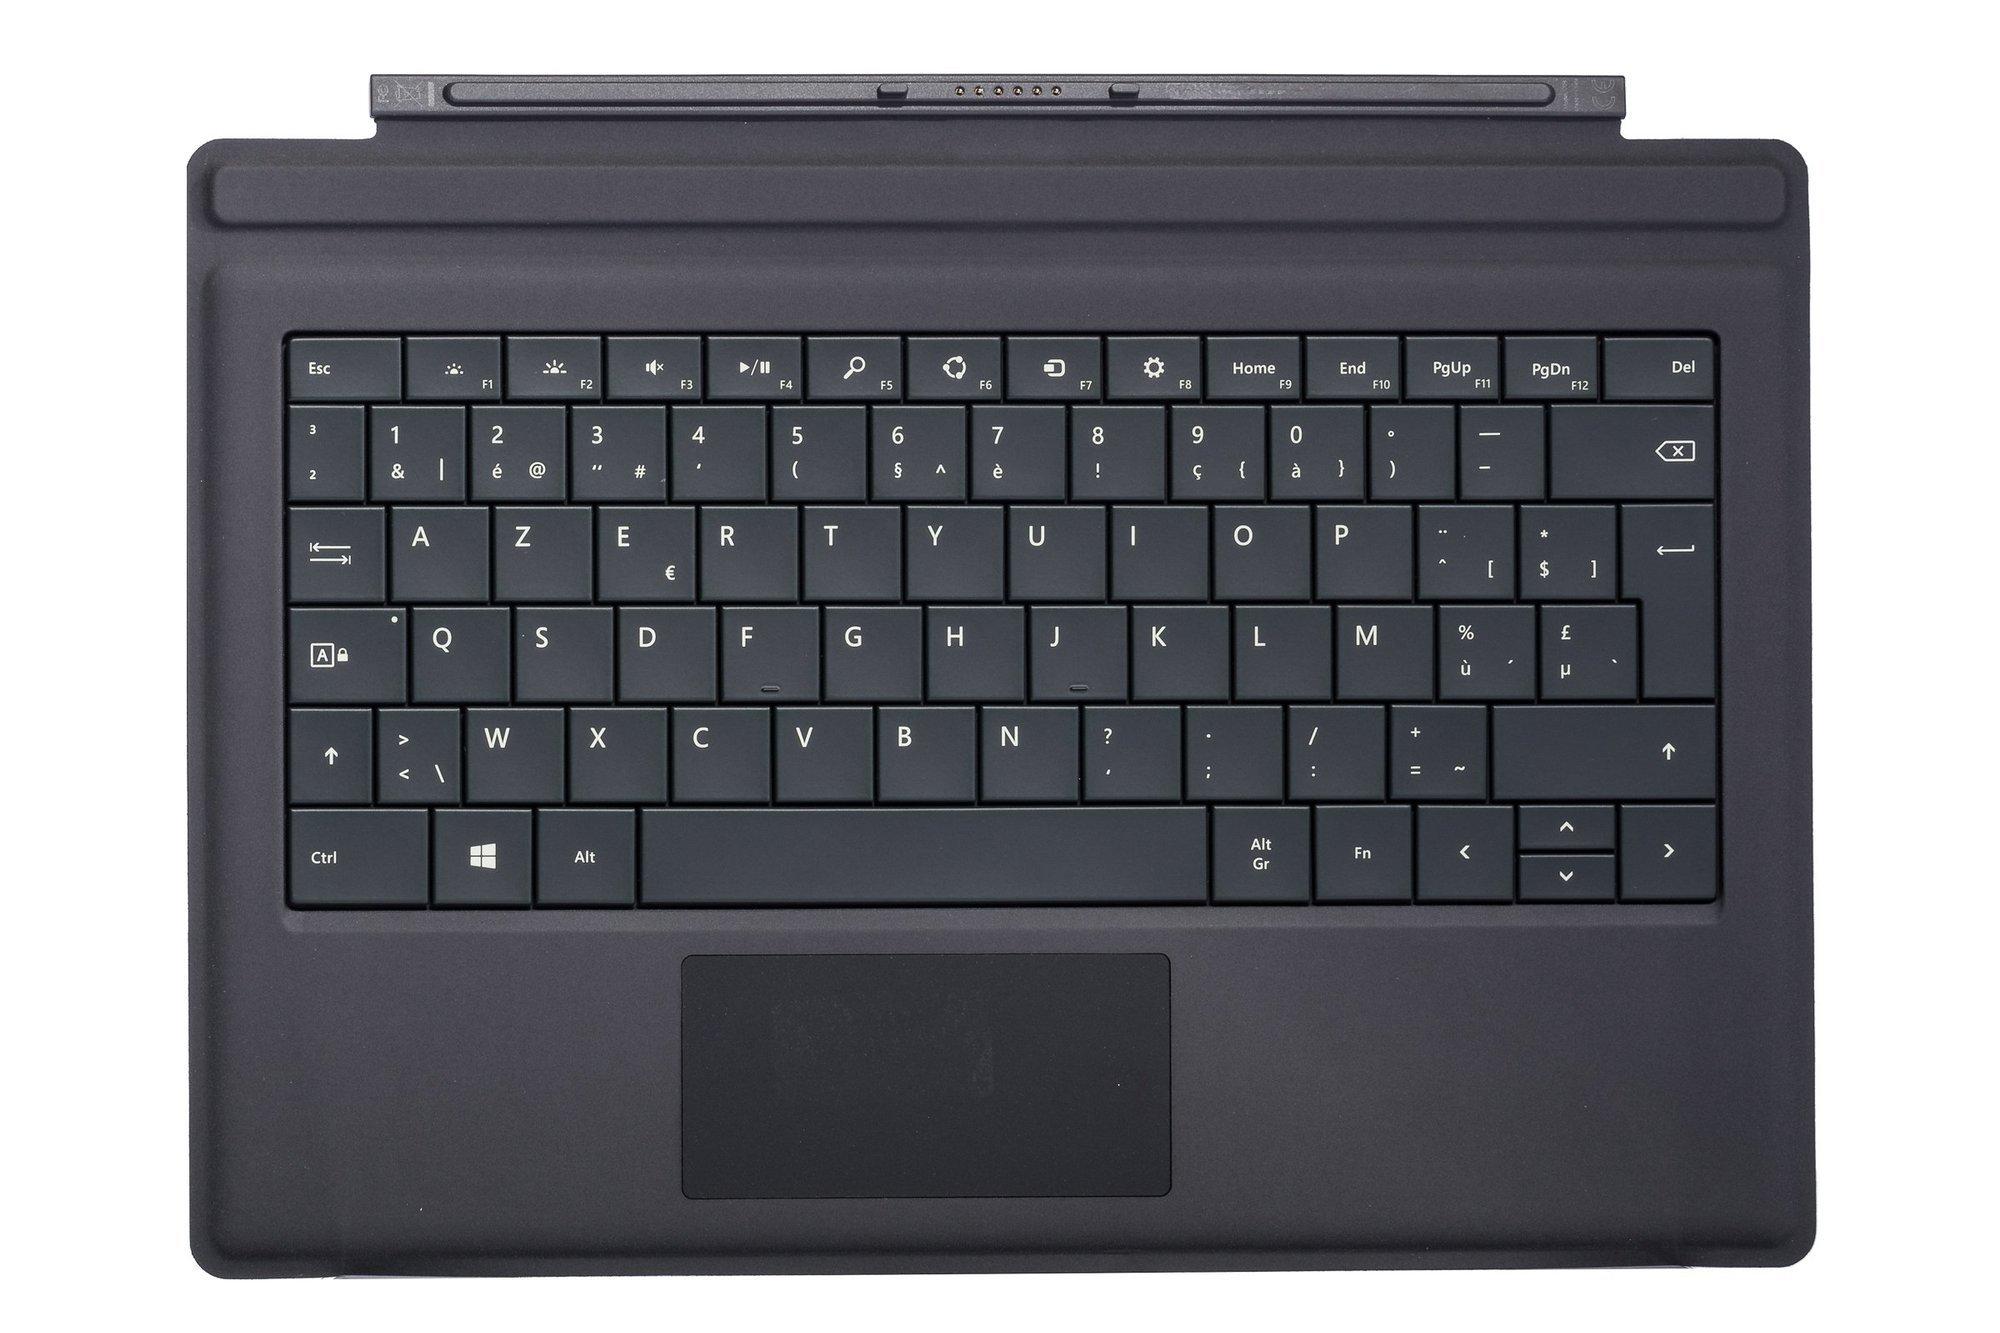 Keyboard Microsoft Surface Type Cover Pro 3 Black AZERTY (Belgian) Grade A